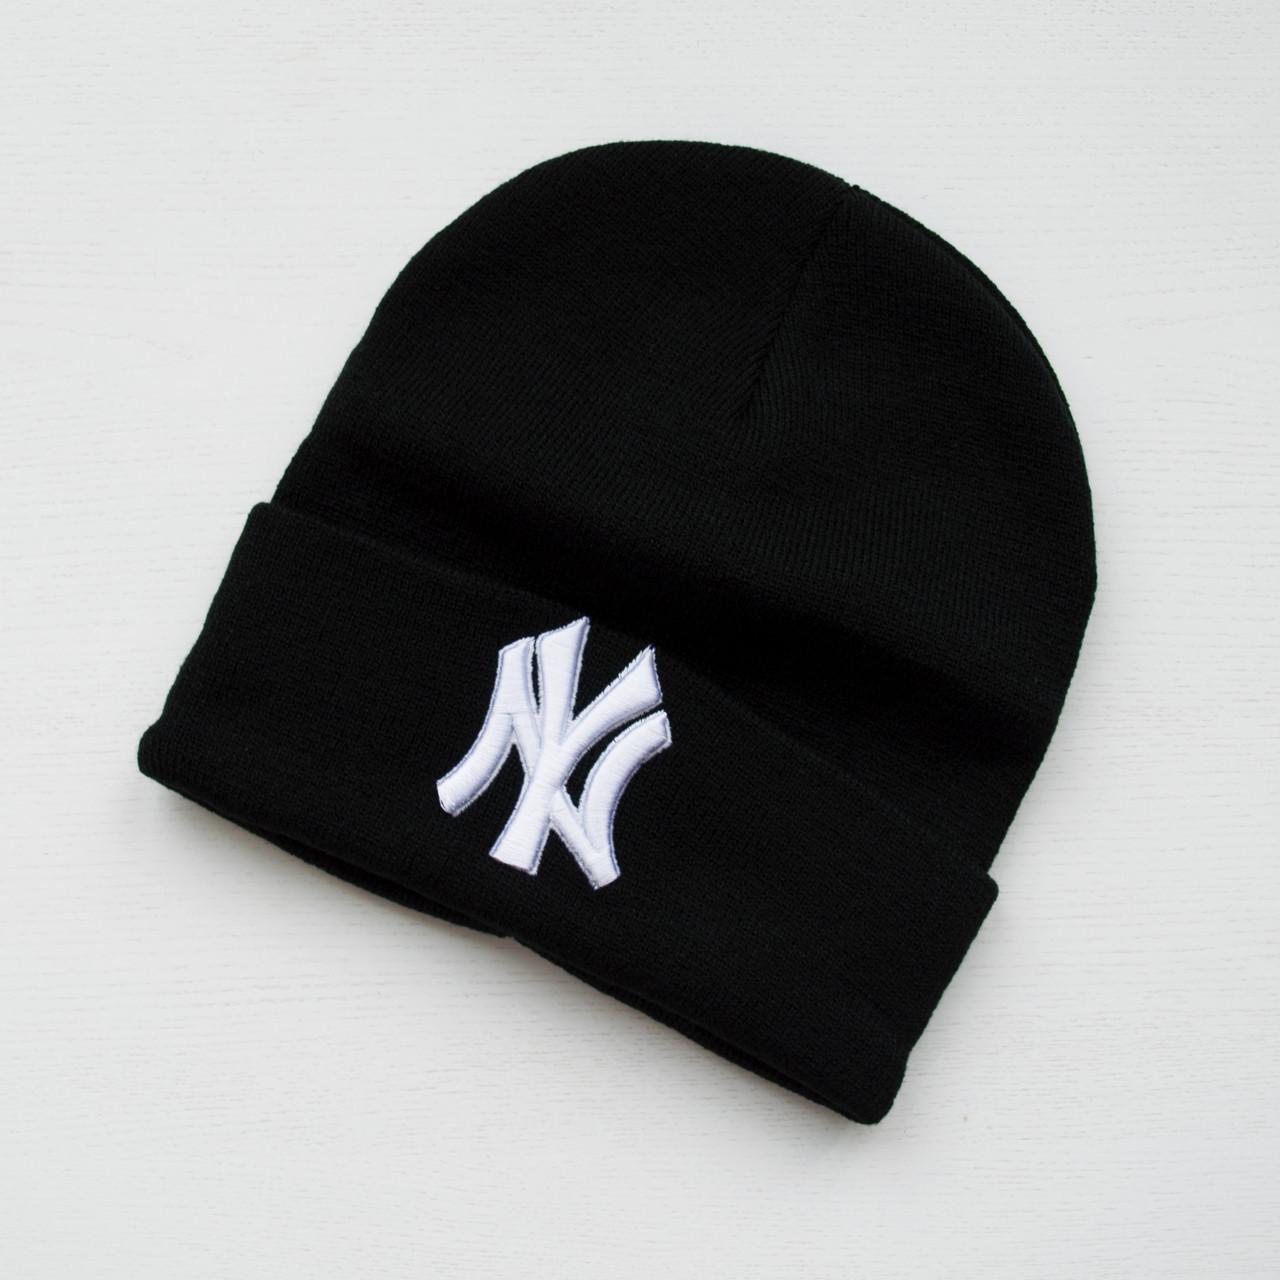 Зимова шапка чорна унісекс New York